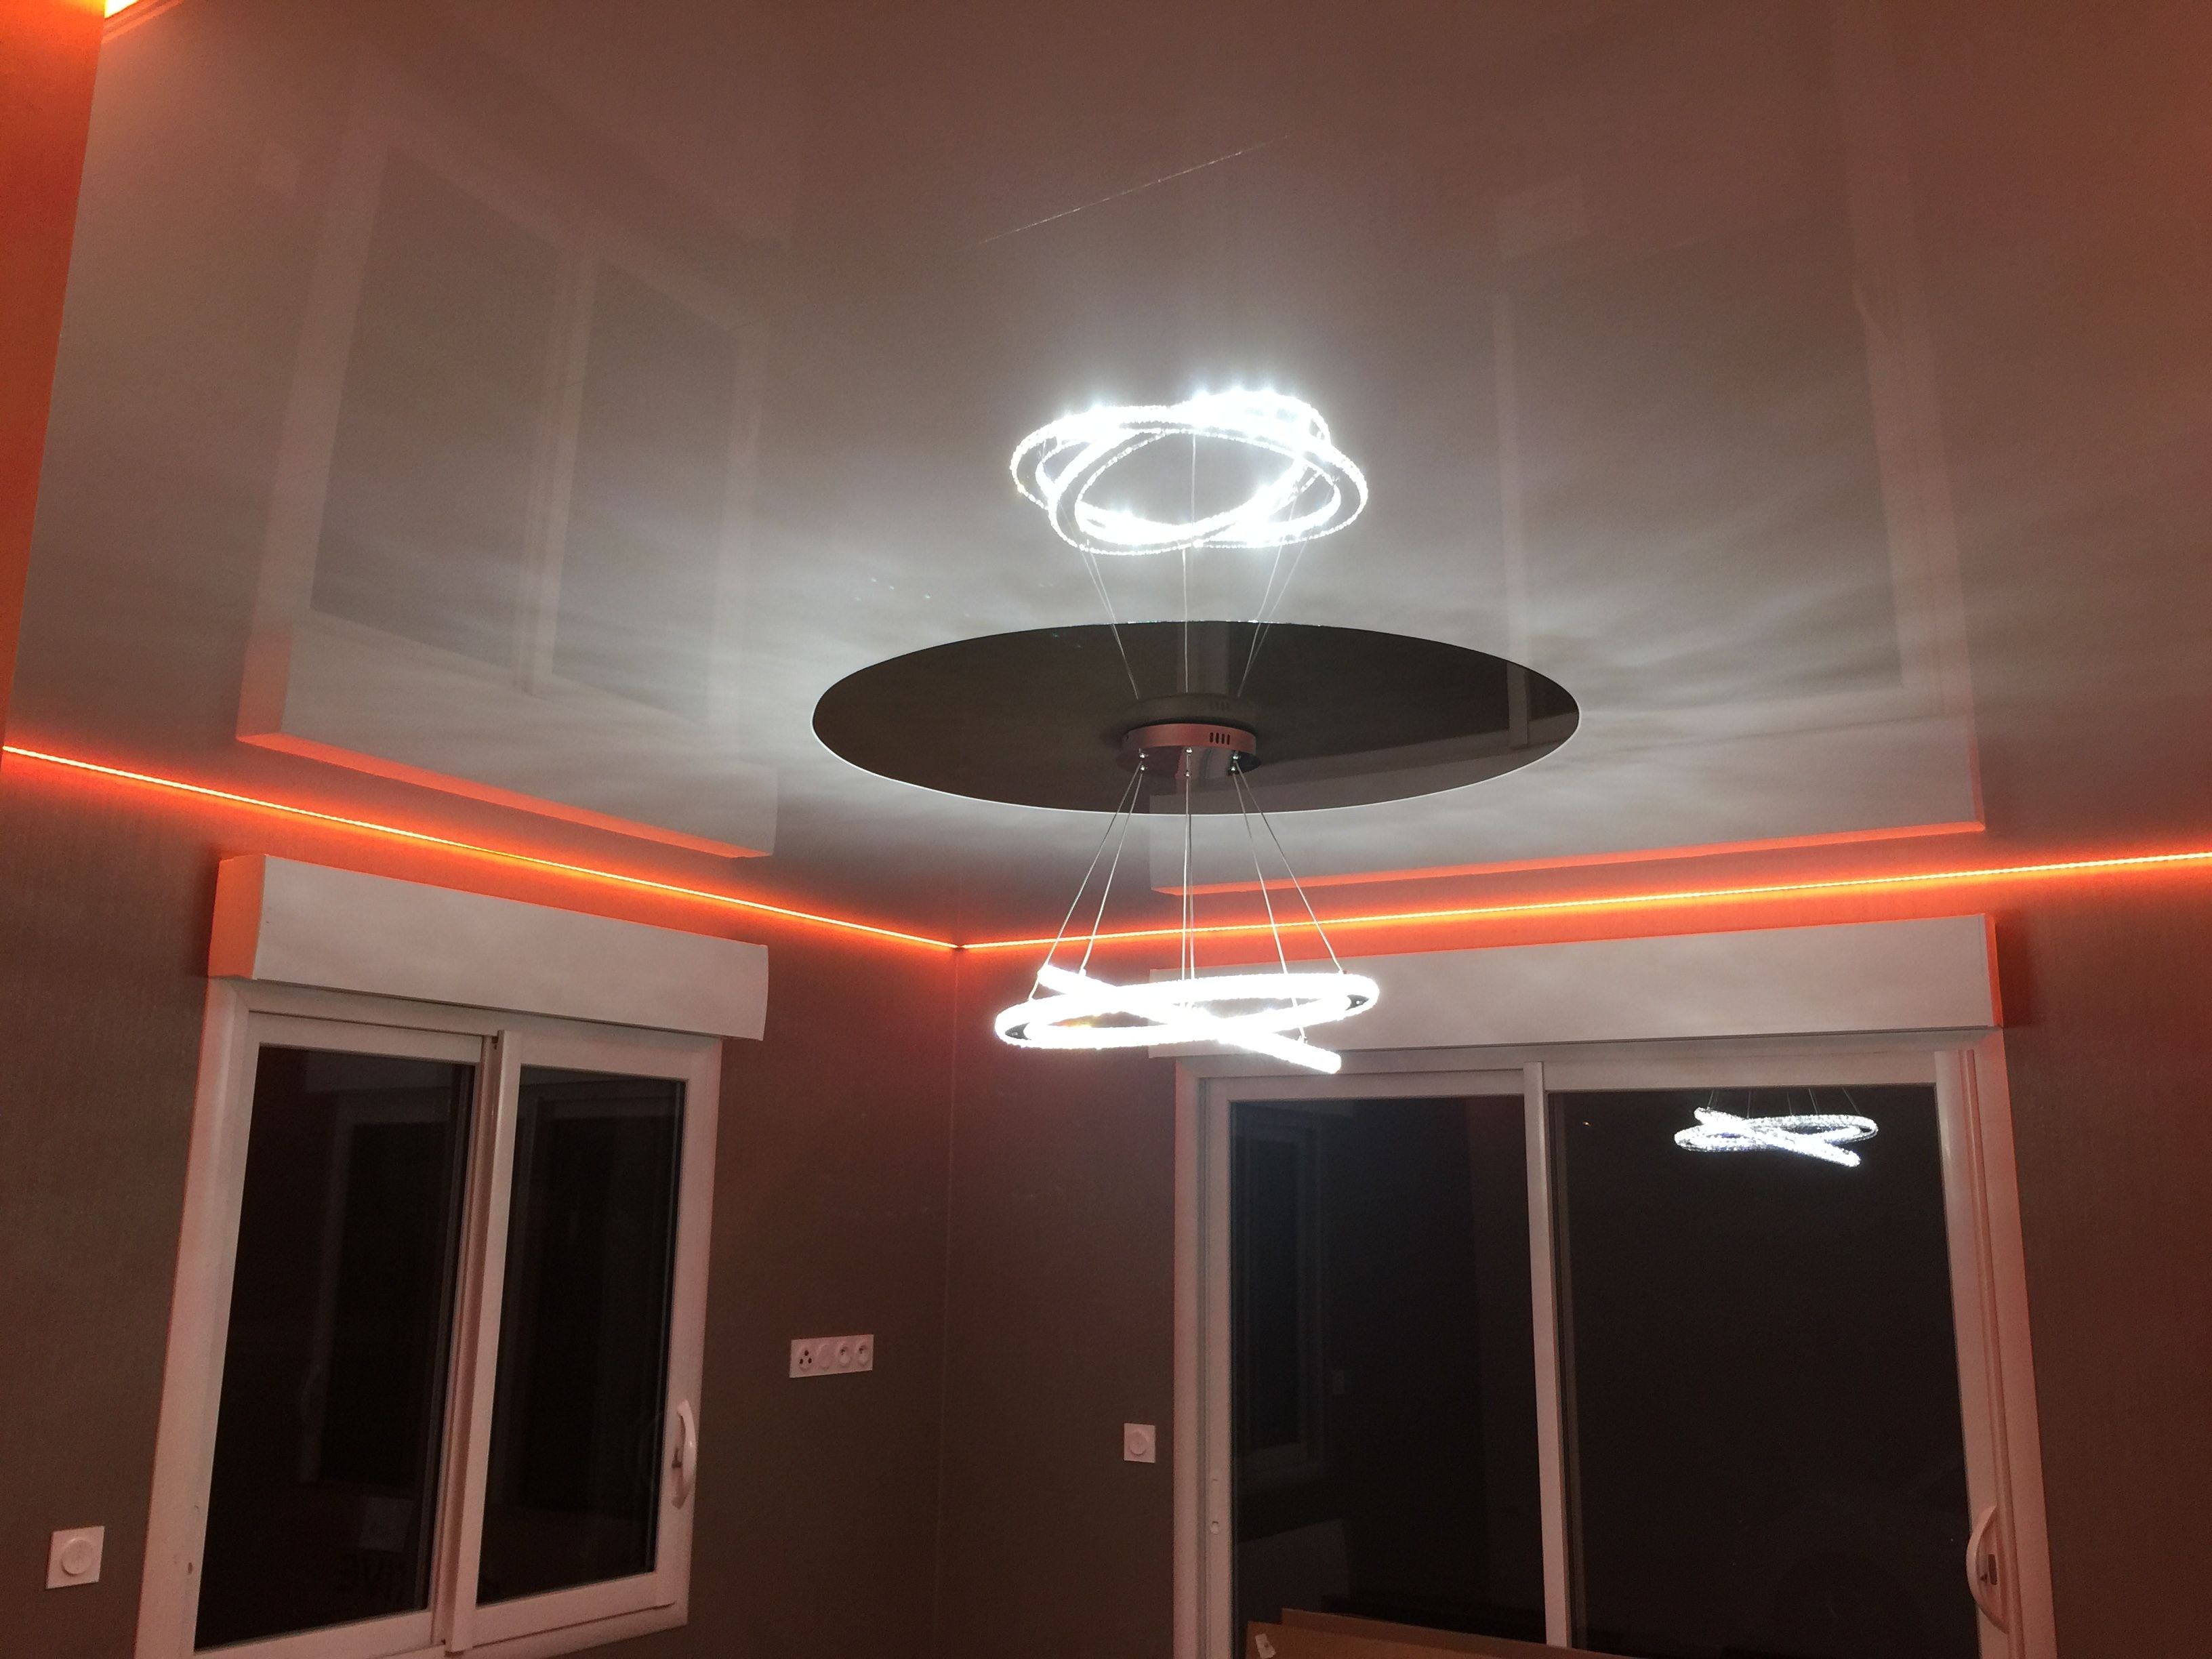 Plafond Tendu Inove Avec Périphérie Led Rgb Inove Fabricant